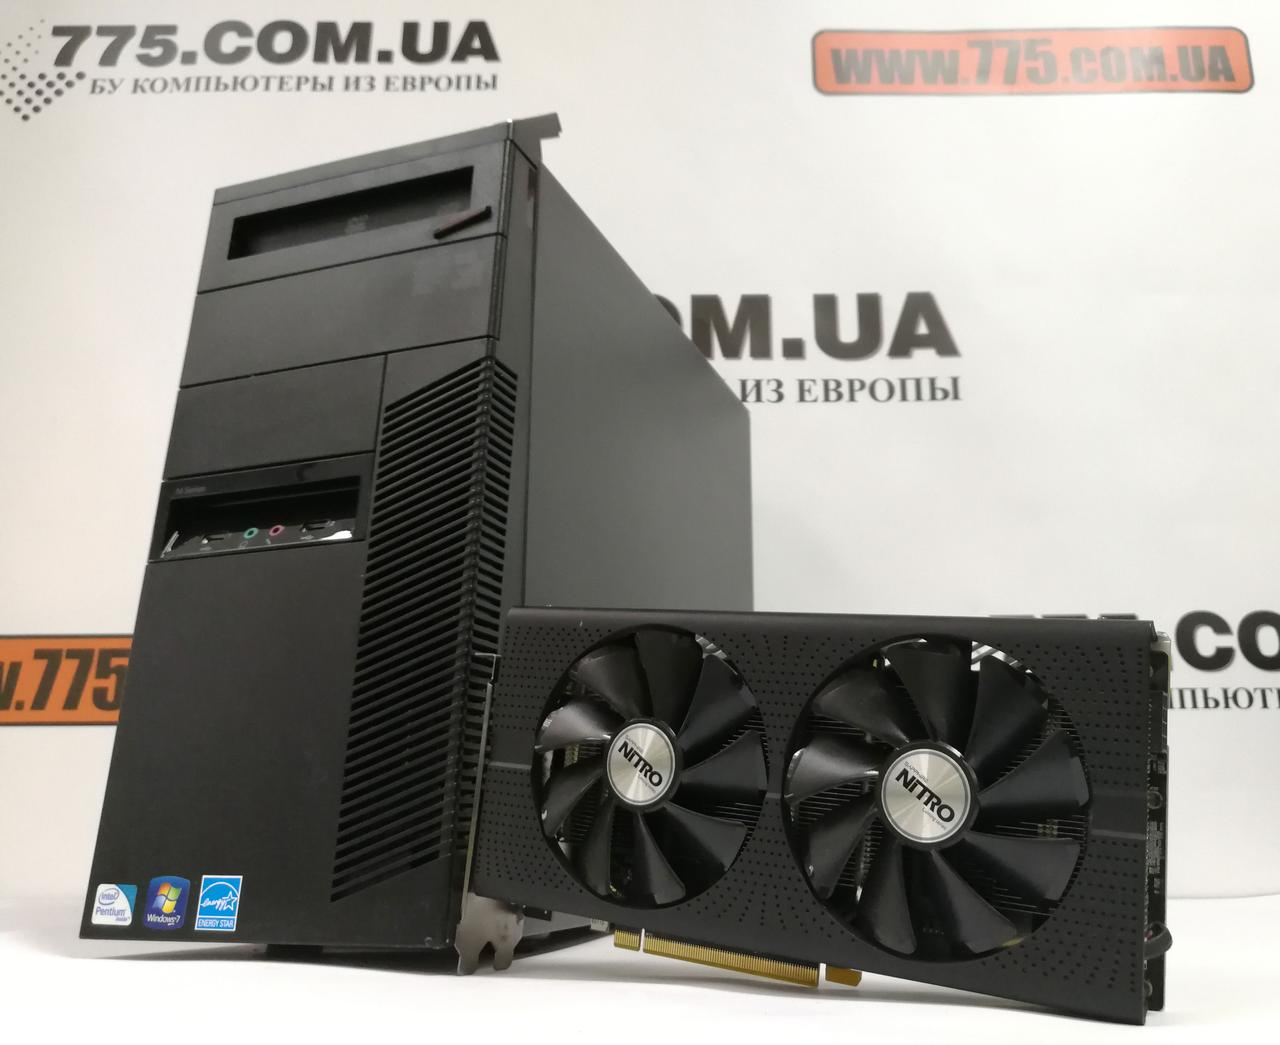 Компьютер Lenovo M82, Intel Core i5-3470 3.6GHz, RAM 12ГБ, SSD 120ГБ, HDD 500ГБ, Radeon RX470 8GB